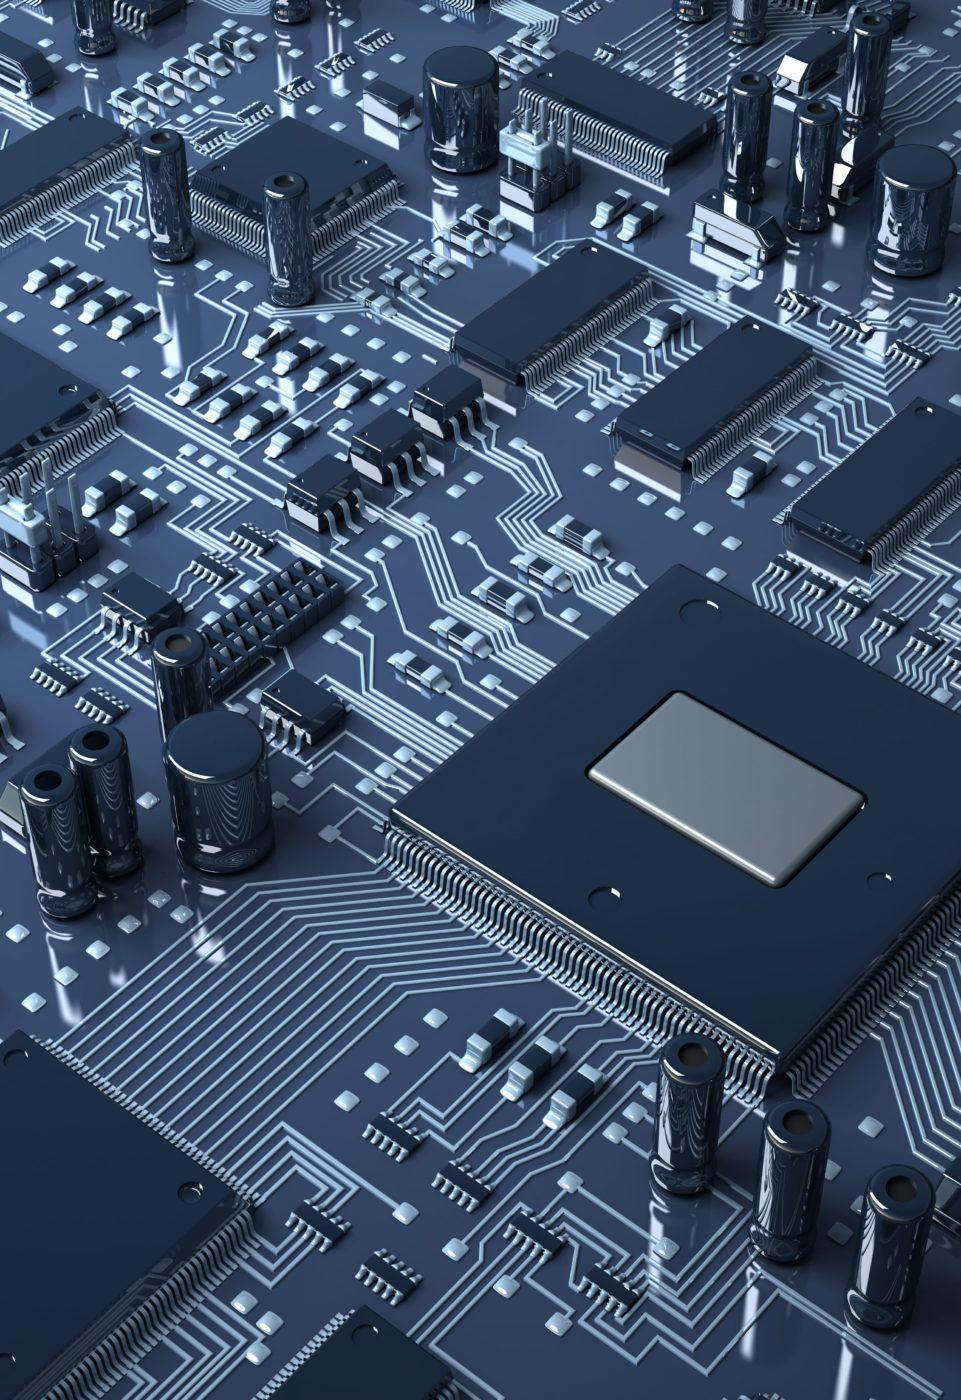 CAMELOT Intelligent Data Services (CIDS) - Title